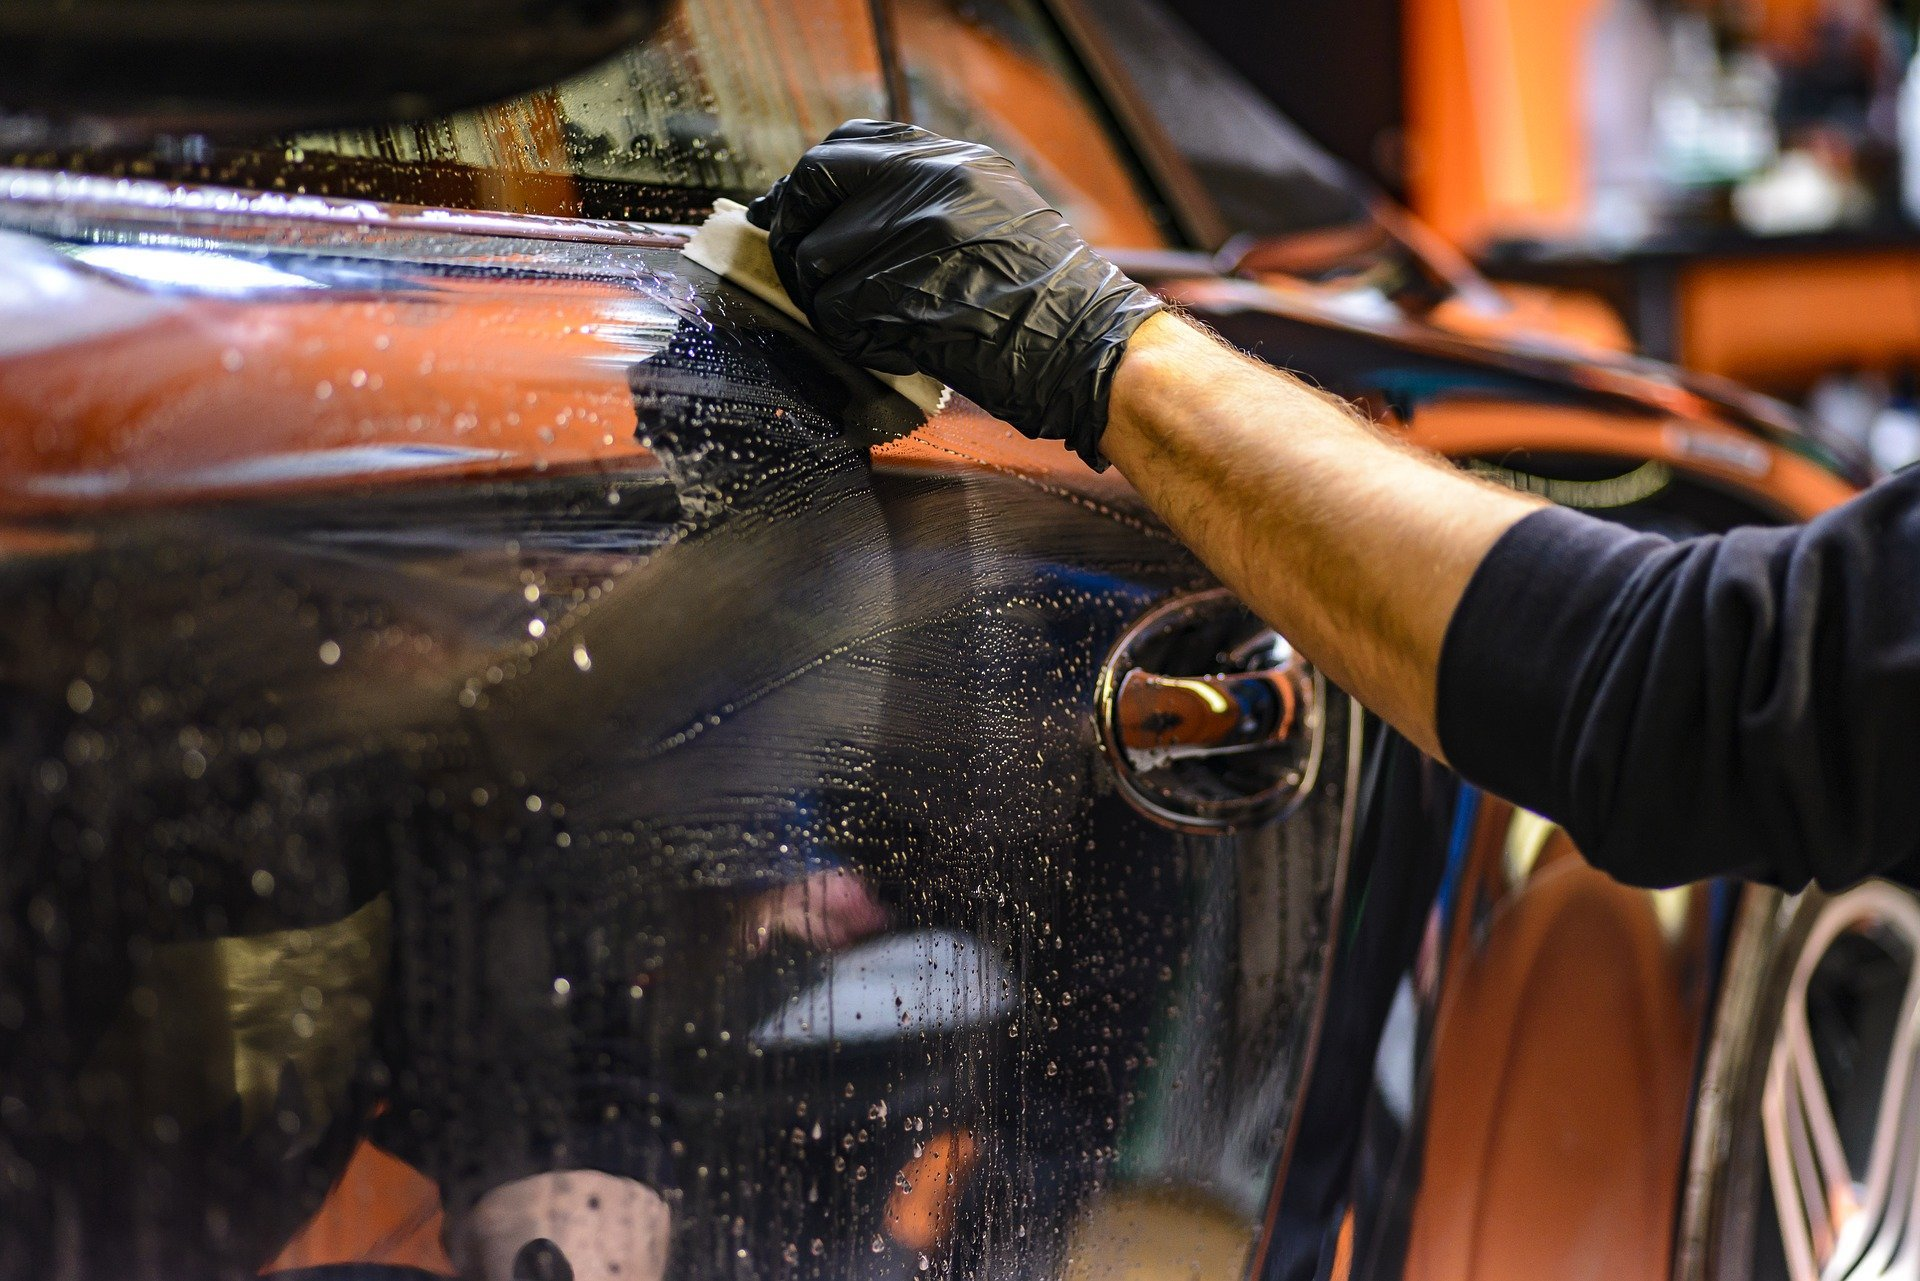 A man cleaning an expensive car. | Source: Dariusz Sankowski/Pixabay